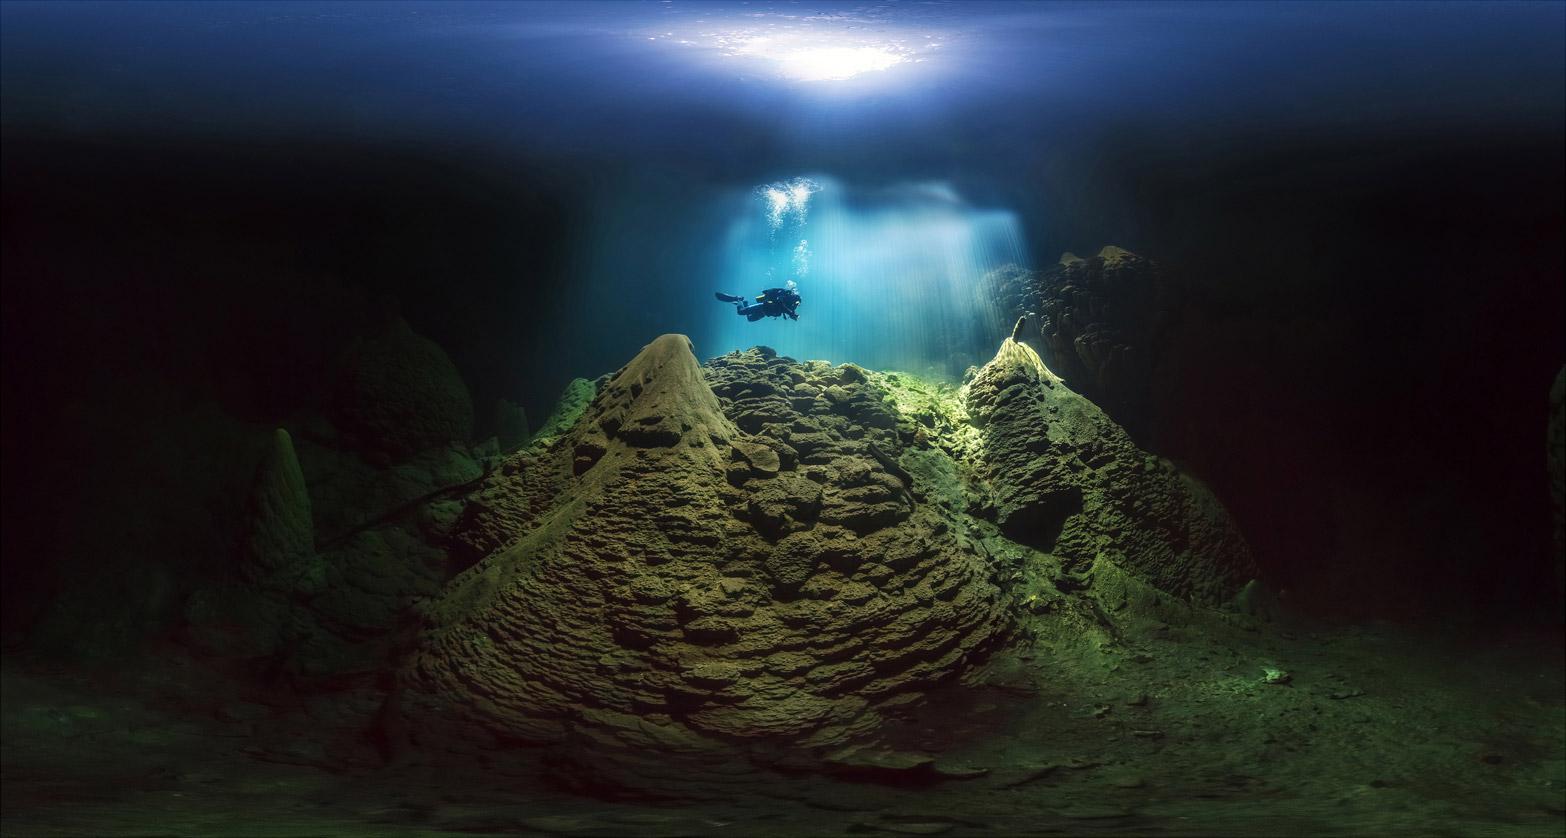 Cave Diving, © Marcio Cabral, CVCEPHOTO Contest